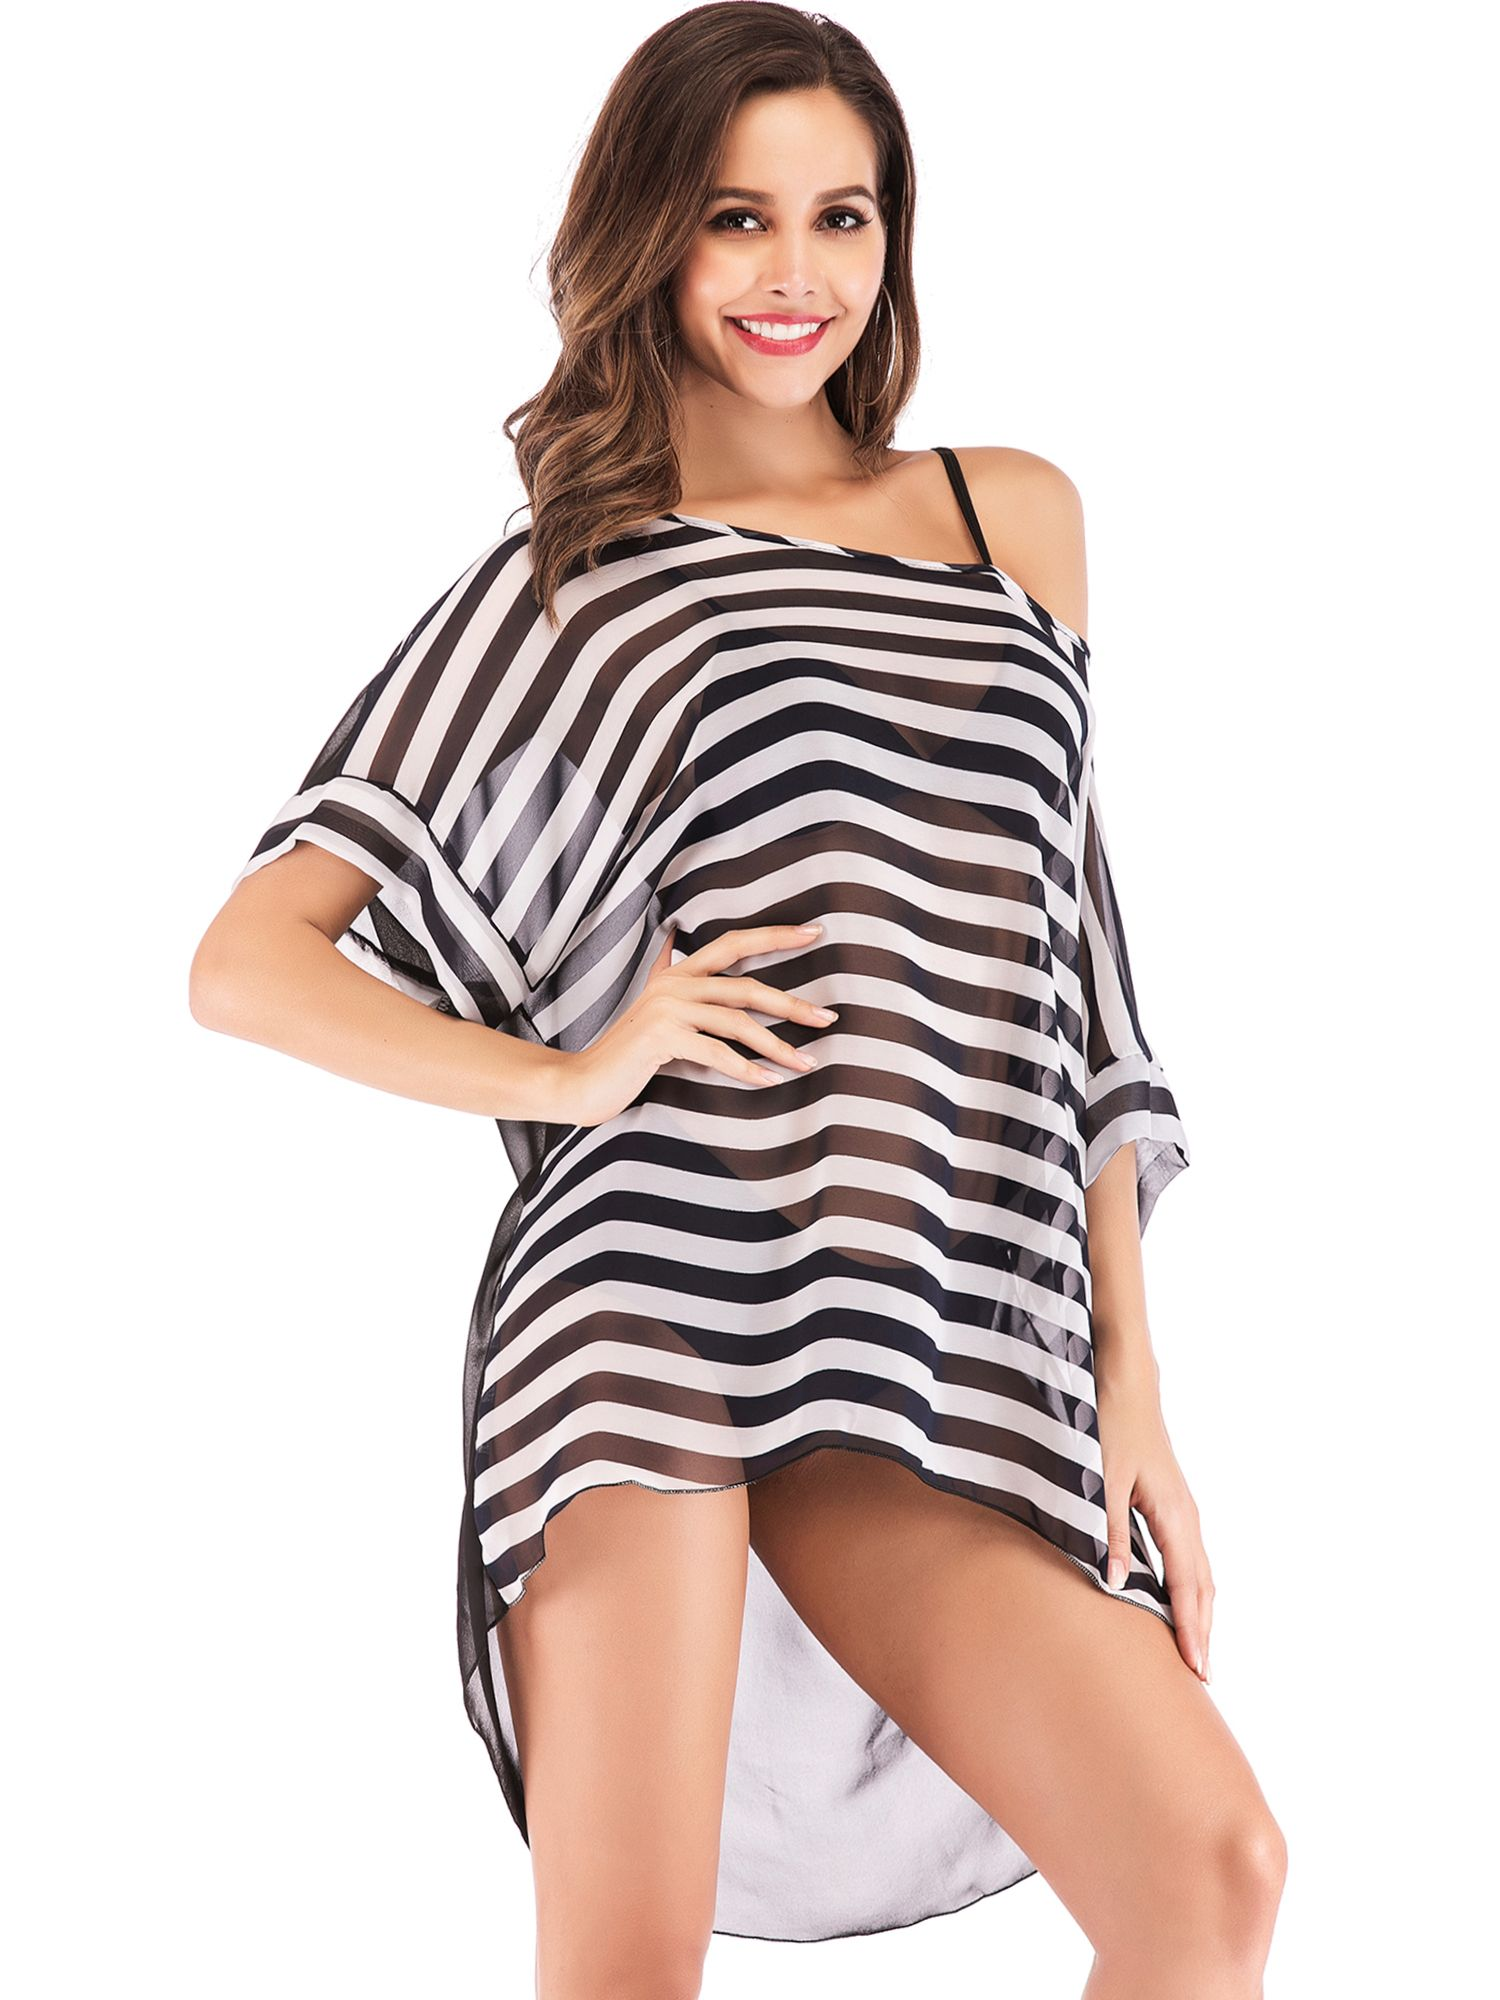 1bcdac638b LELINTA Women?¡¥s Plus Size Bikini Cover Up Warp Stripe Chiffon ...